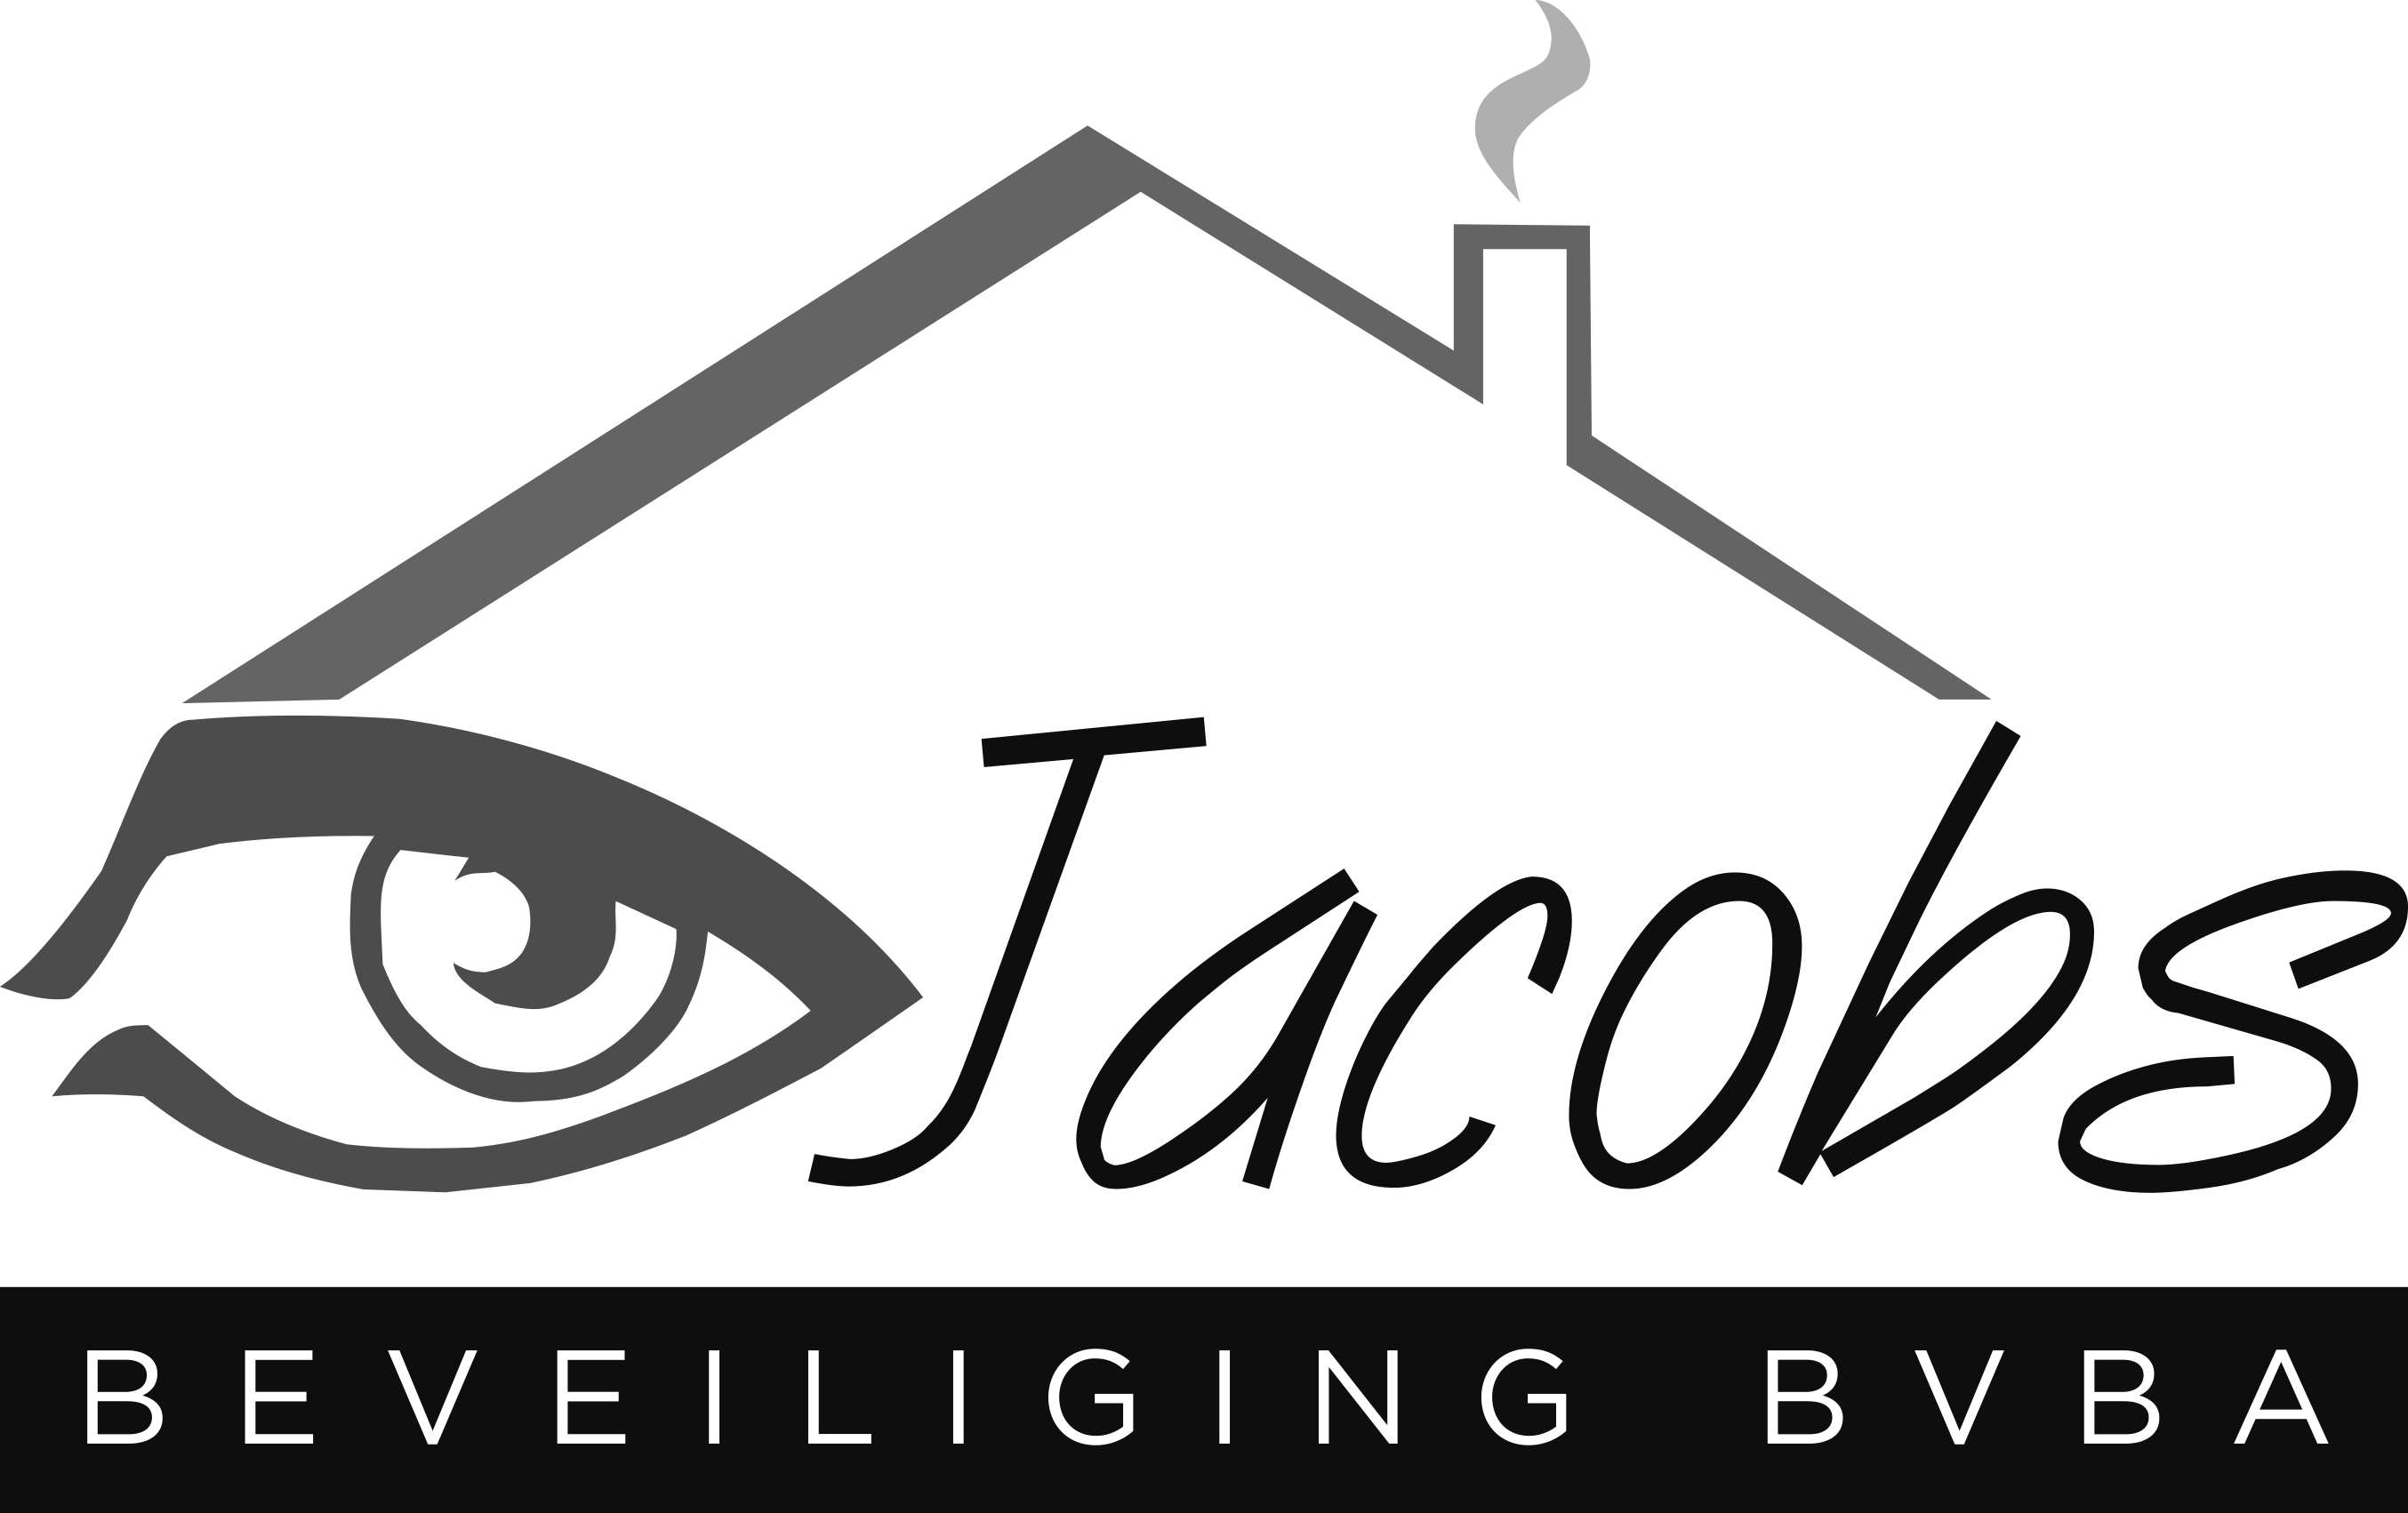 logo_jacobs_beveiliging_BVBA